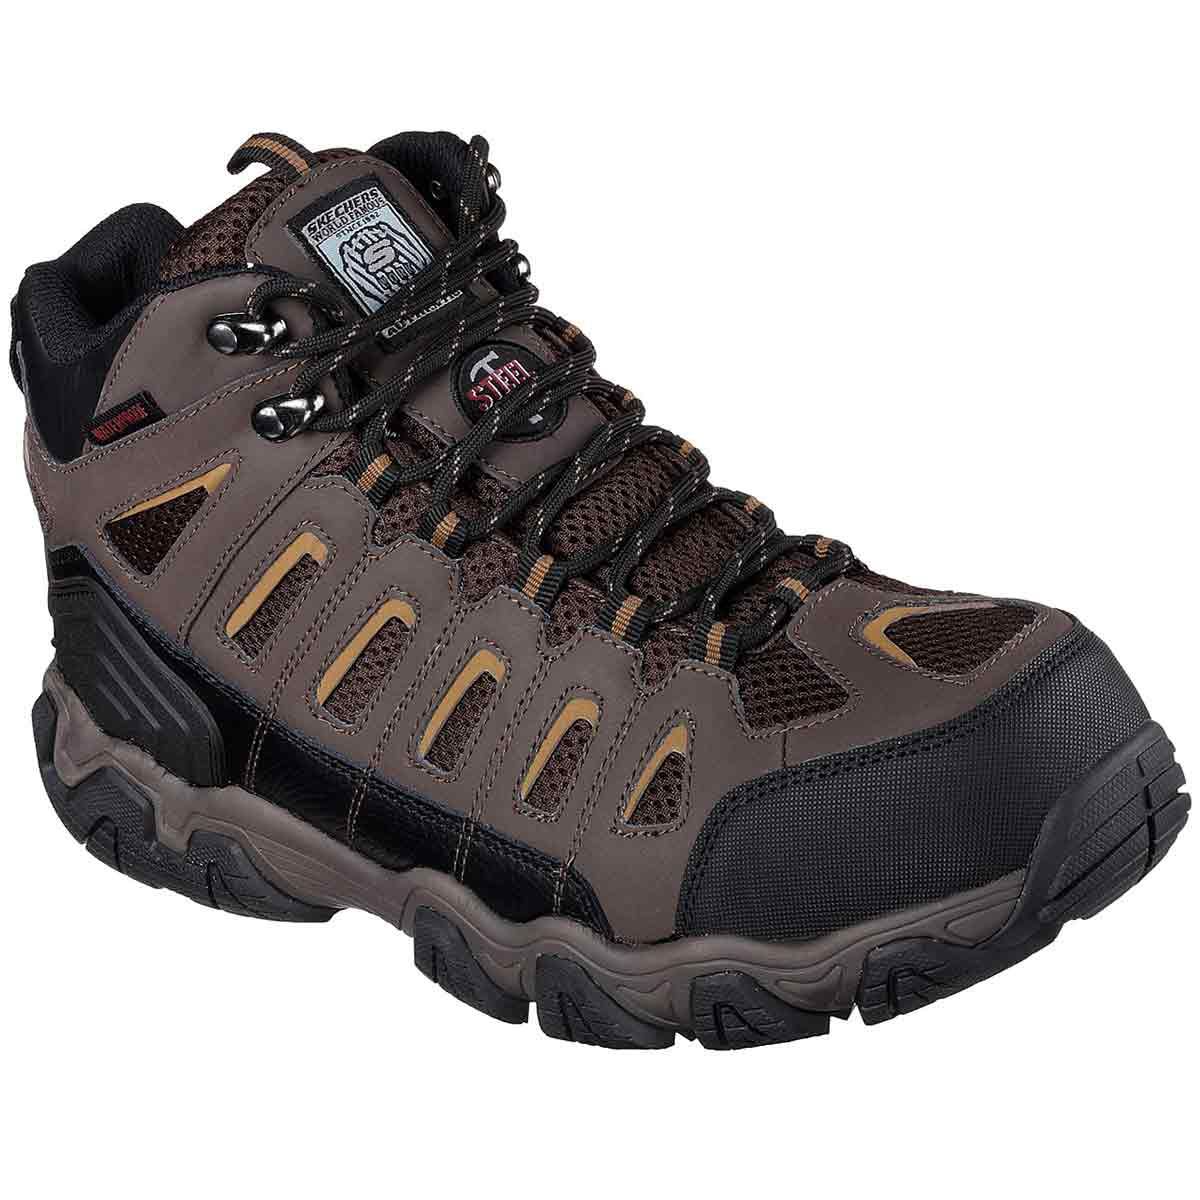 Skechers Men's Blais Bixford Steel Toe Work Shoes - Brown, 8